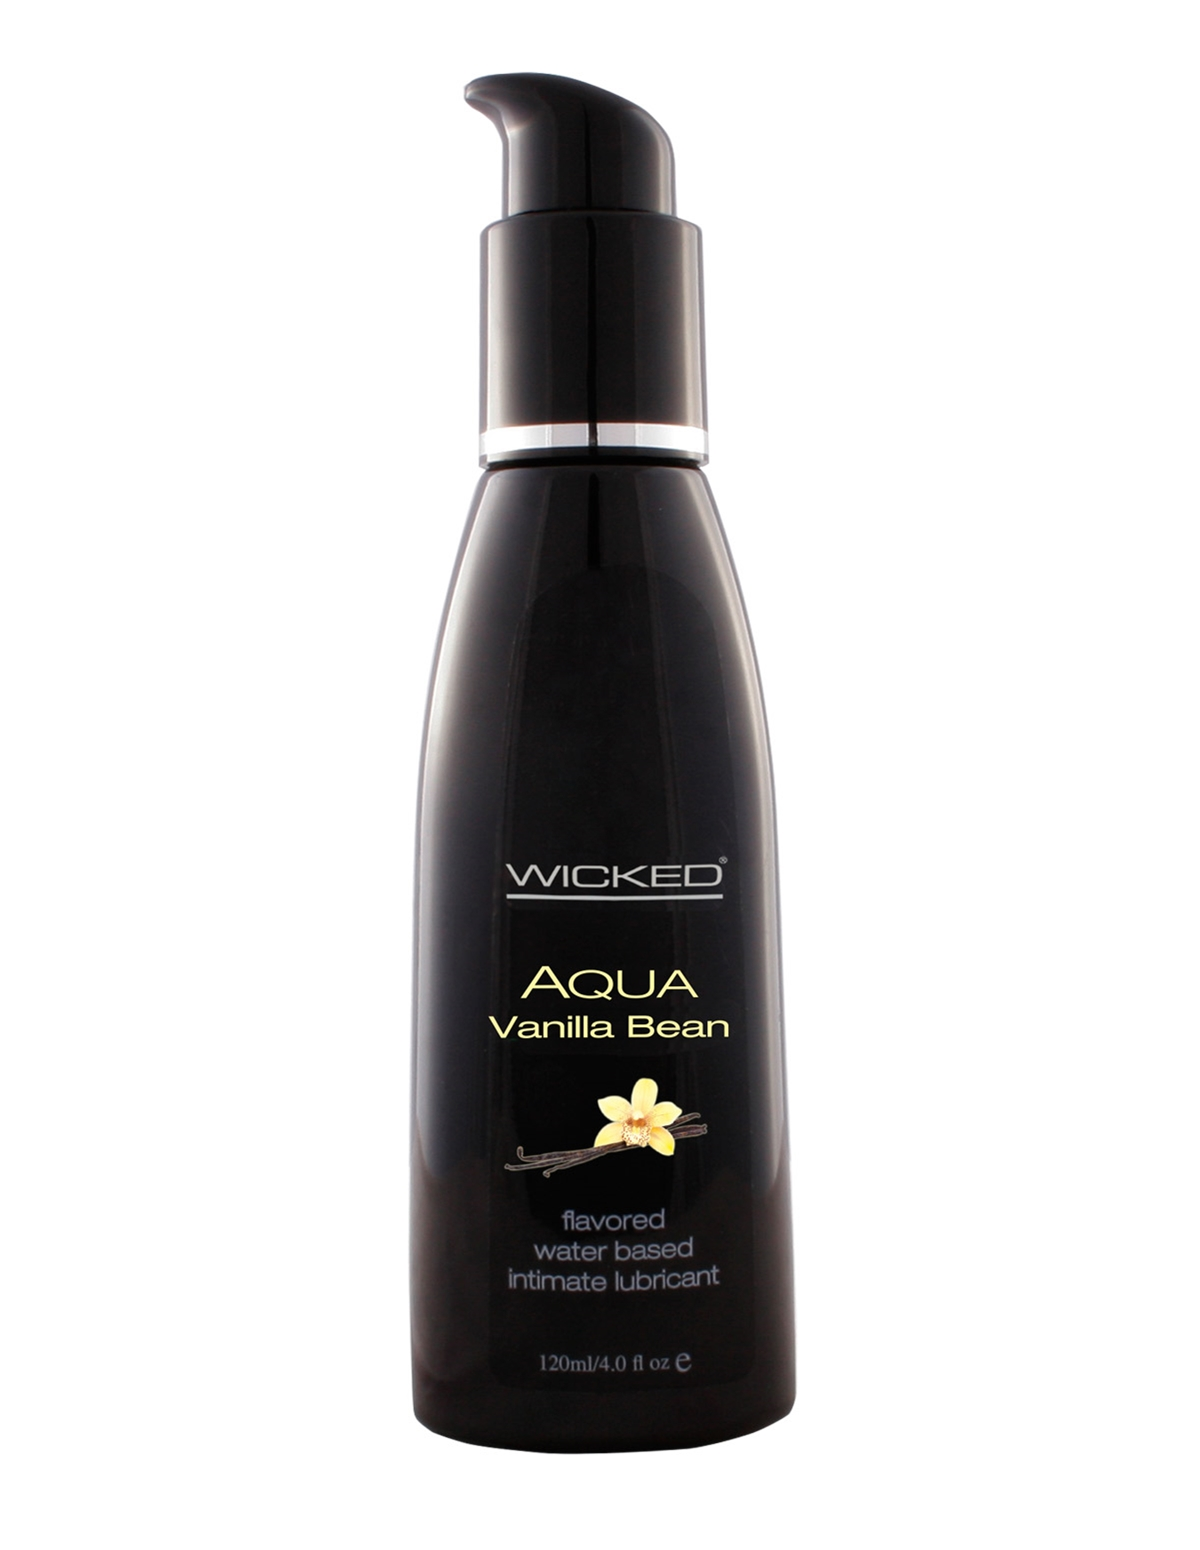 Aqua Vanilla Bean Lubricant